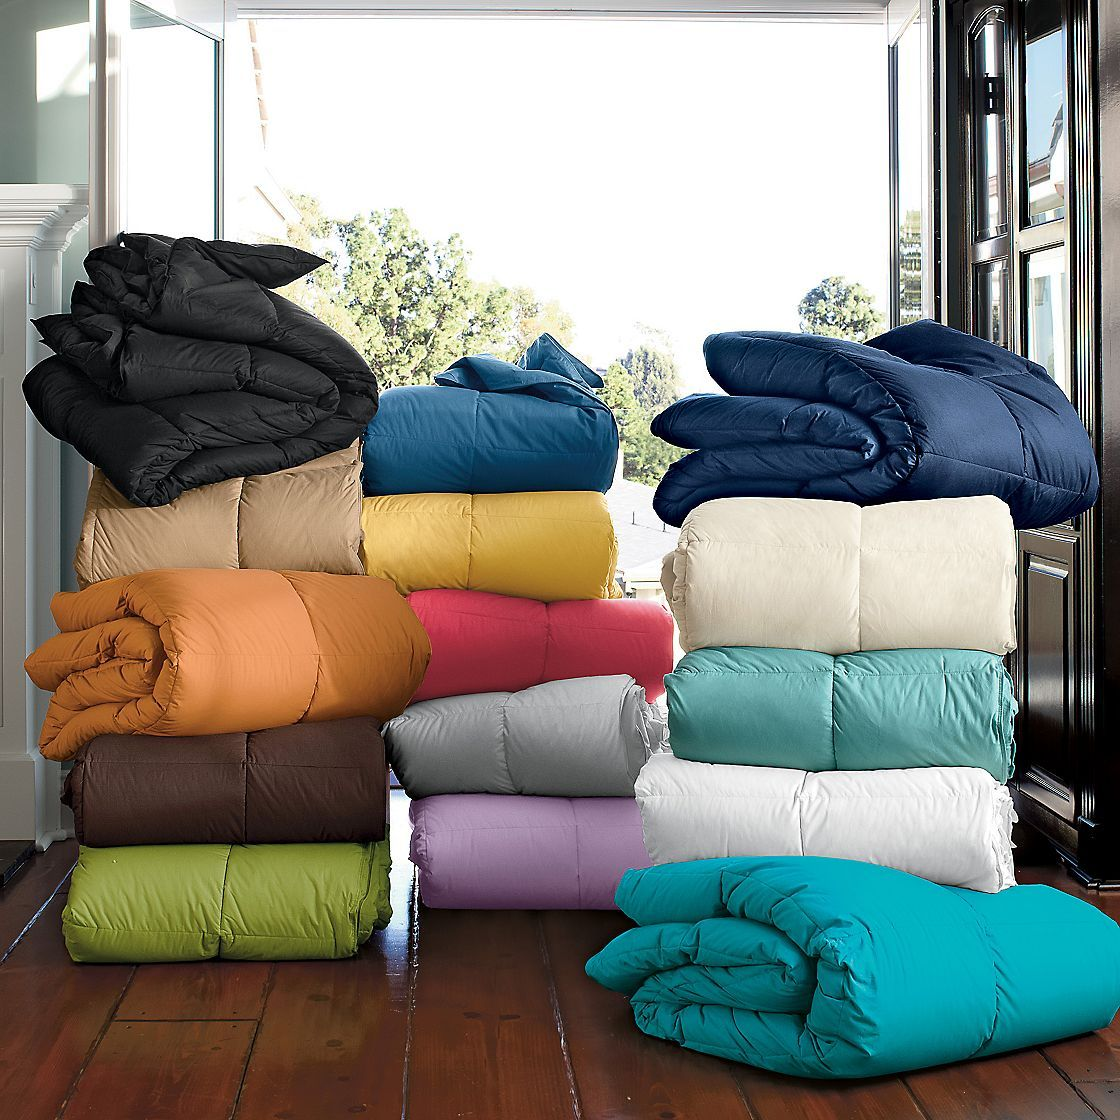 Amazon.com: CoverMates – Canvas Comforter Storage Bag ... |Storing Comforters